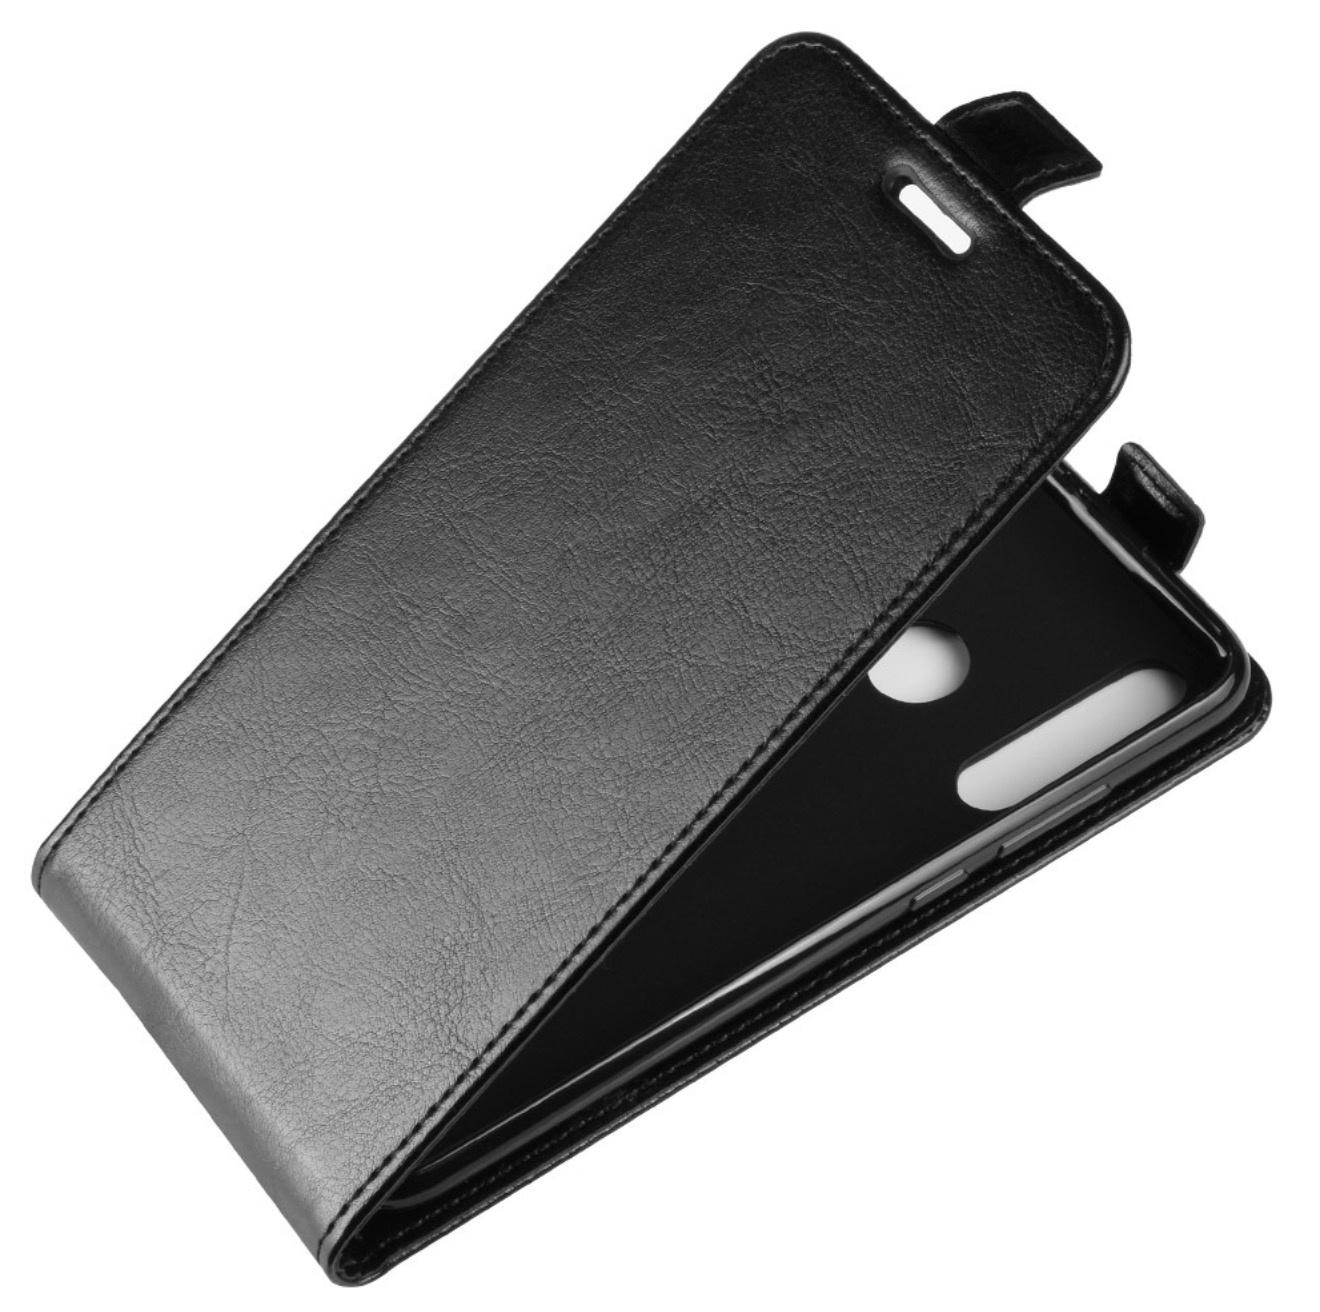 Чехол-флип MyPads для Sony Xperia L S36h (C2105) вертикальный откидной черный lcd screen display for sony xperia l s36h s36 c2105 by free shipping hq